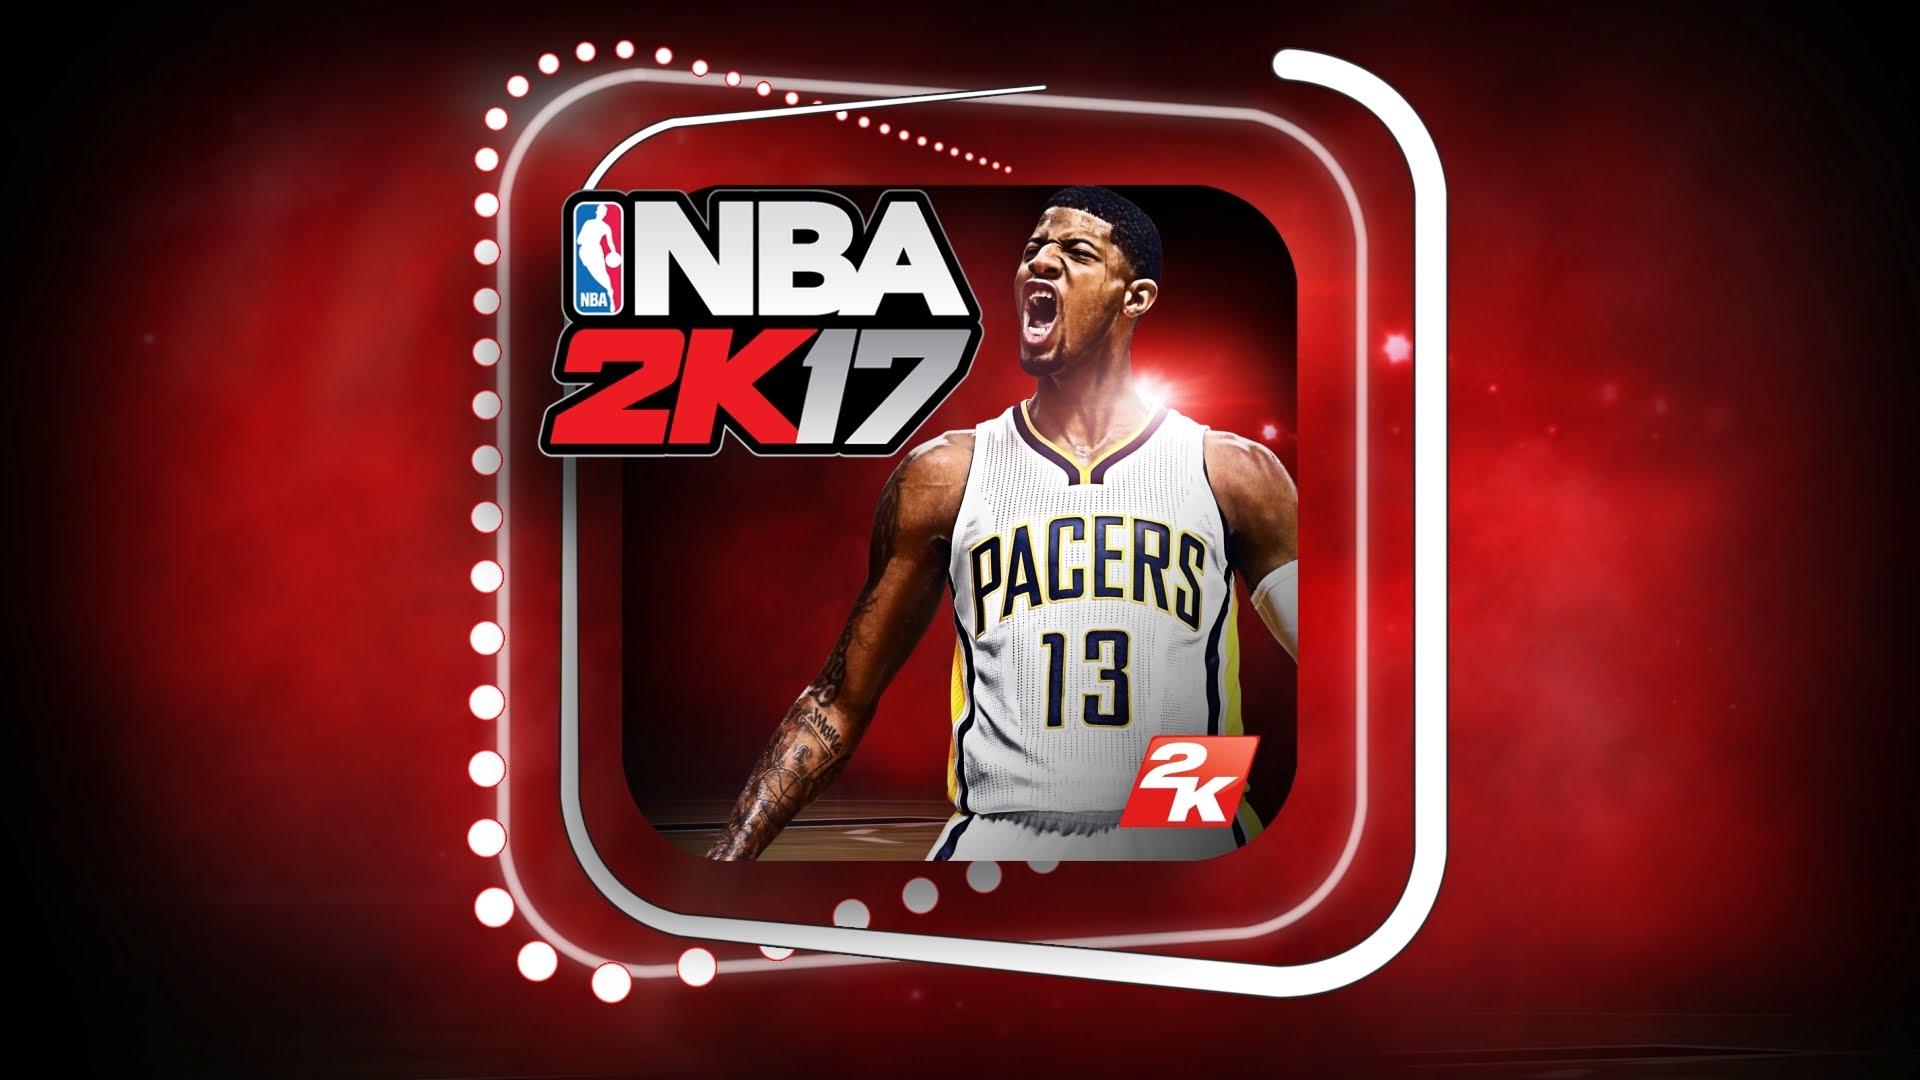 NBA 2K17 Mobil – Der Trailer